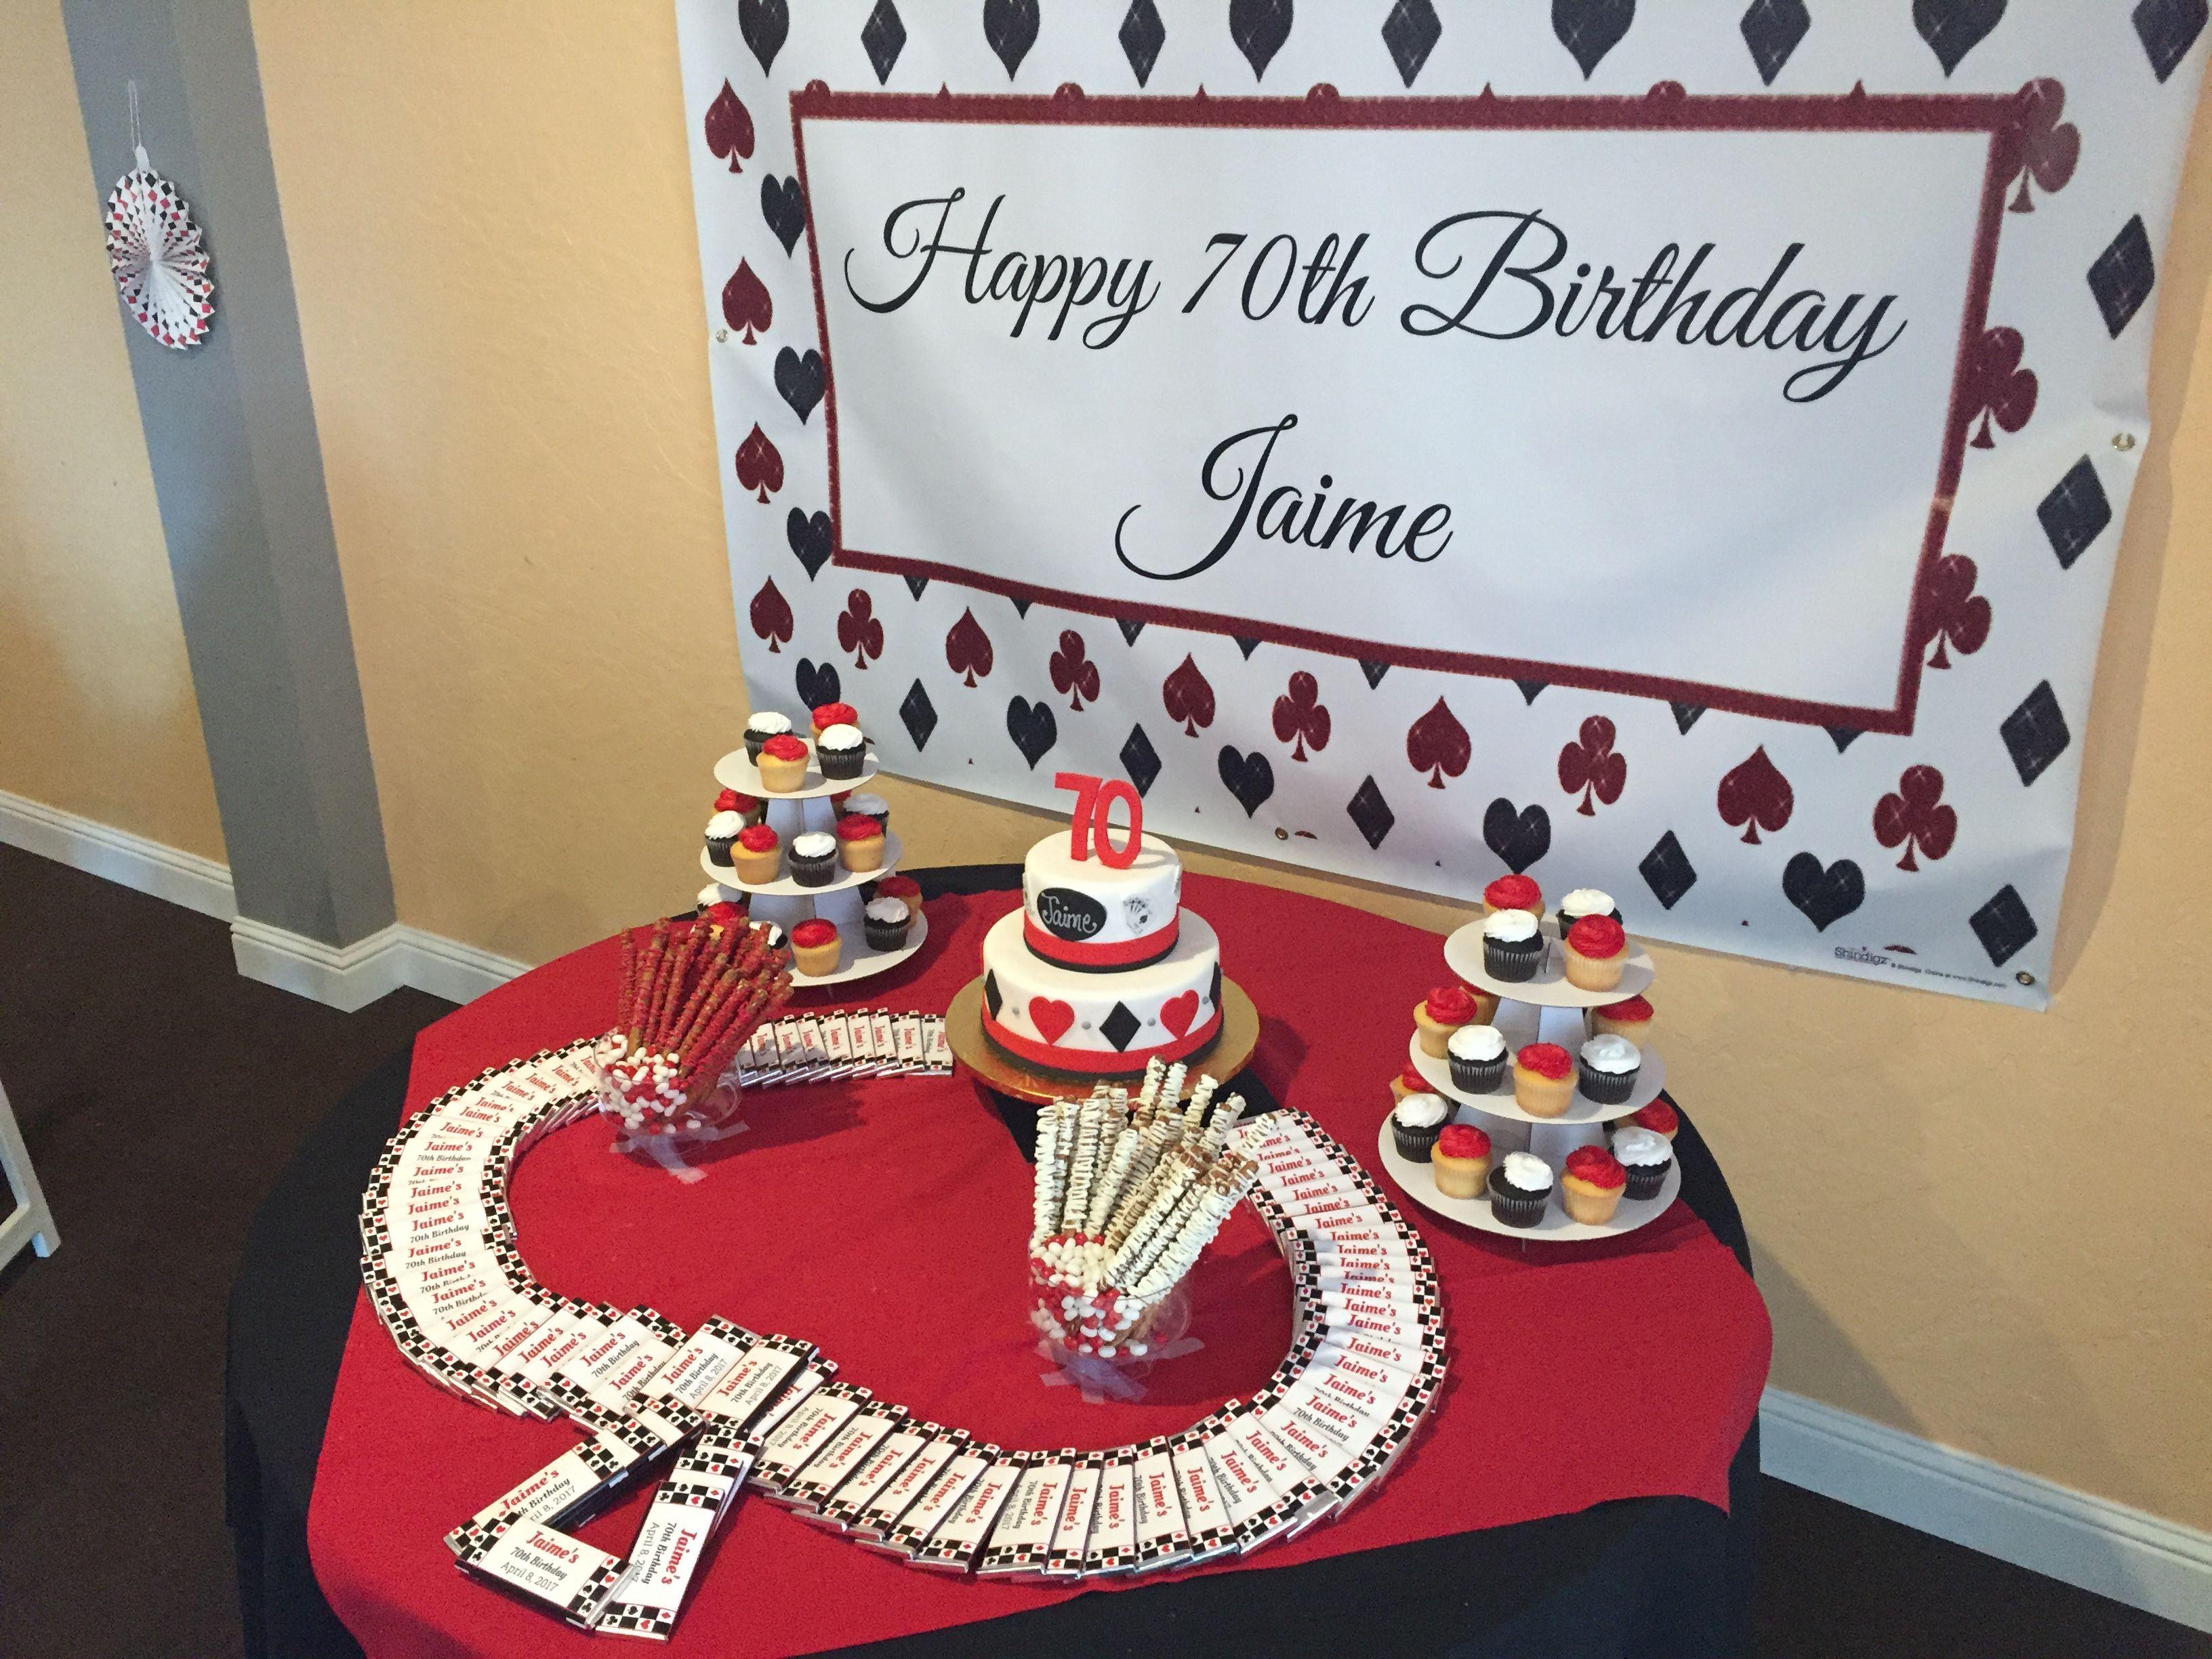 Casino Theme Cake Table Decoration Decor Centerpiece Themed Cakes Casino Theme Casino Theme Parties